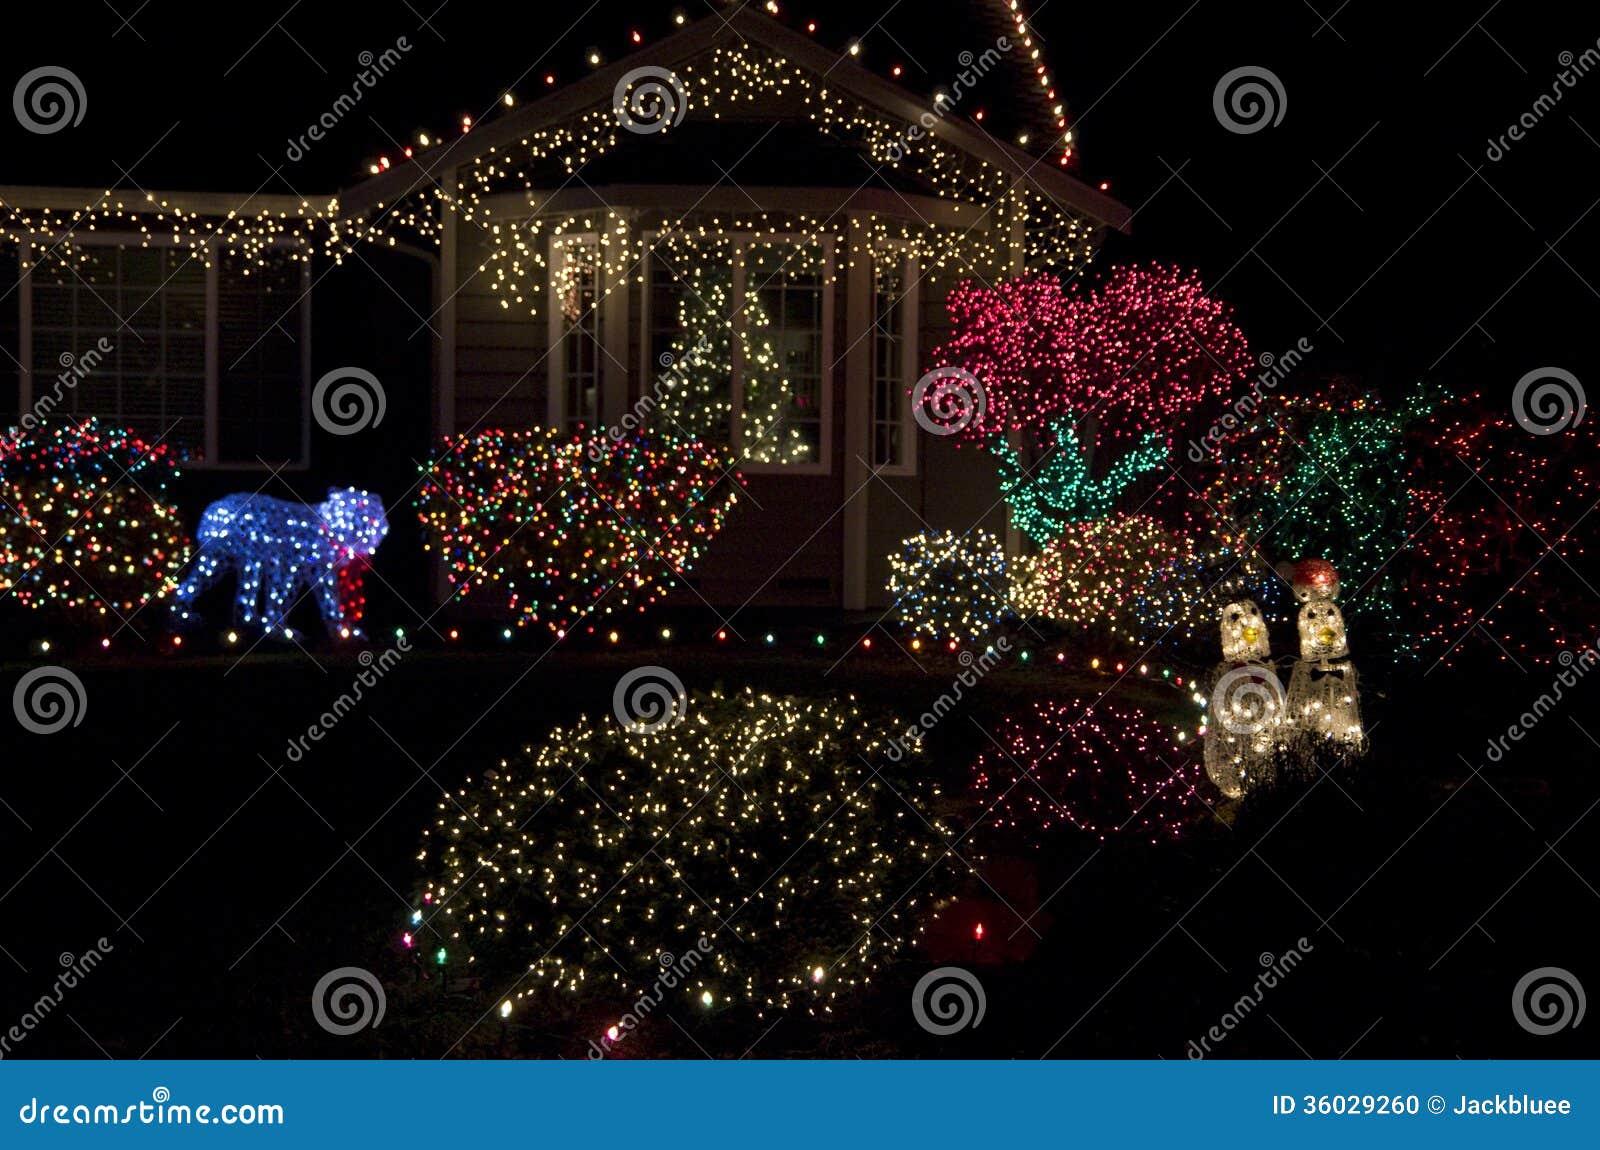 Led Lights For Christmas Trees